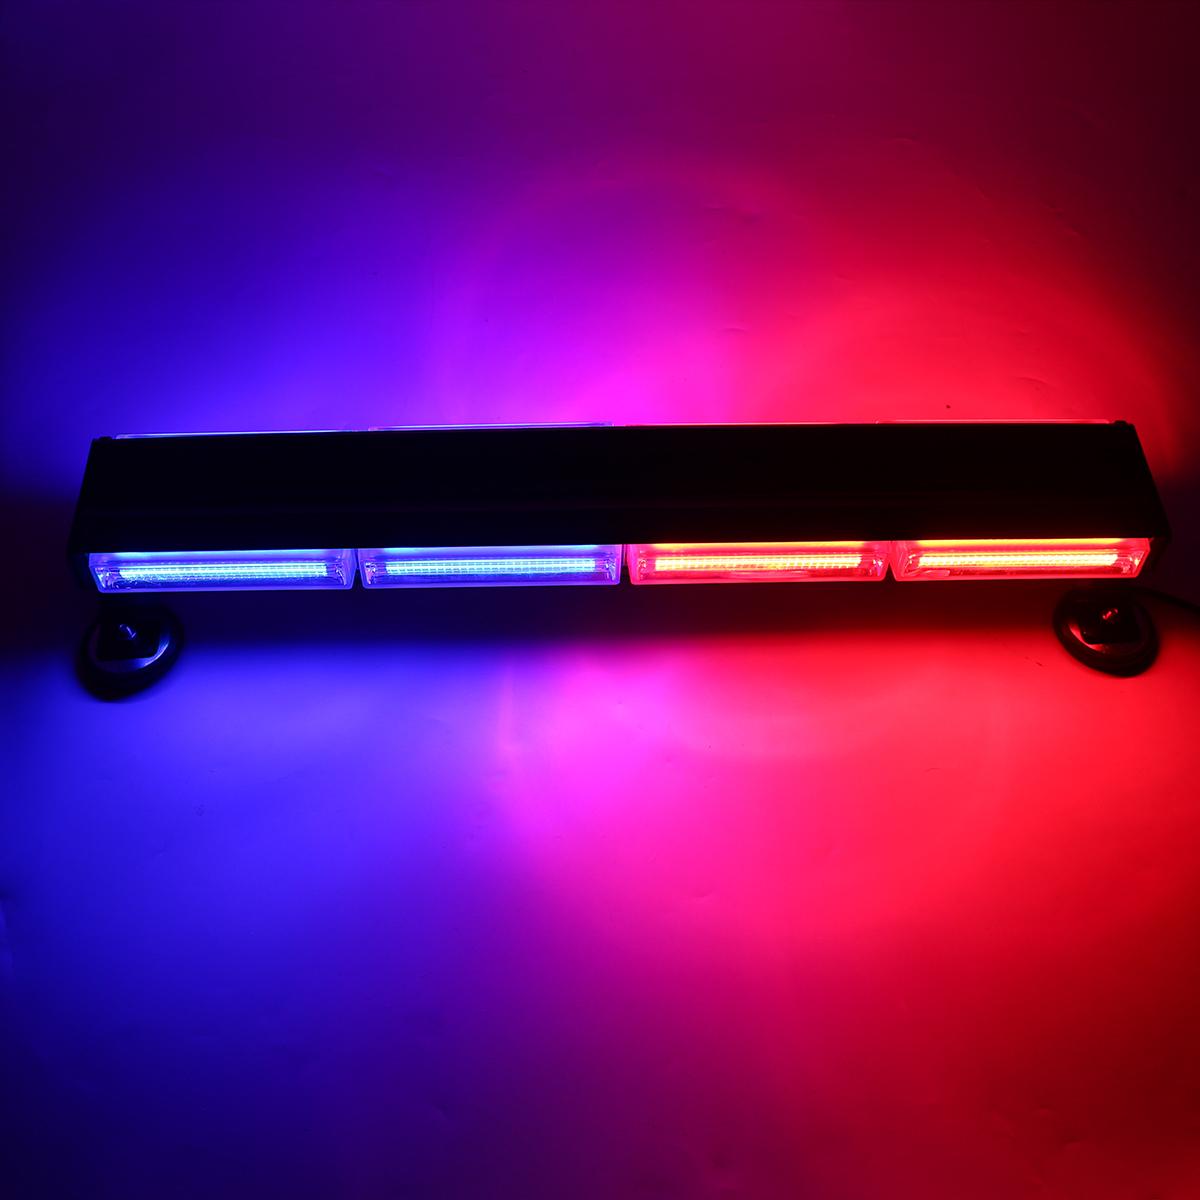 72W LED Strobe Light Bar Double Side Warning Strobe Car Hazard Light Emergency Beacon Flashing Lamp Red&Blue